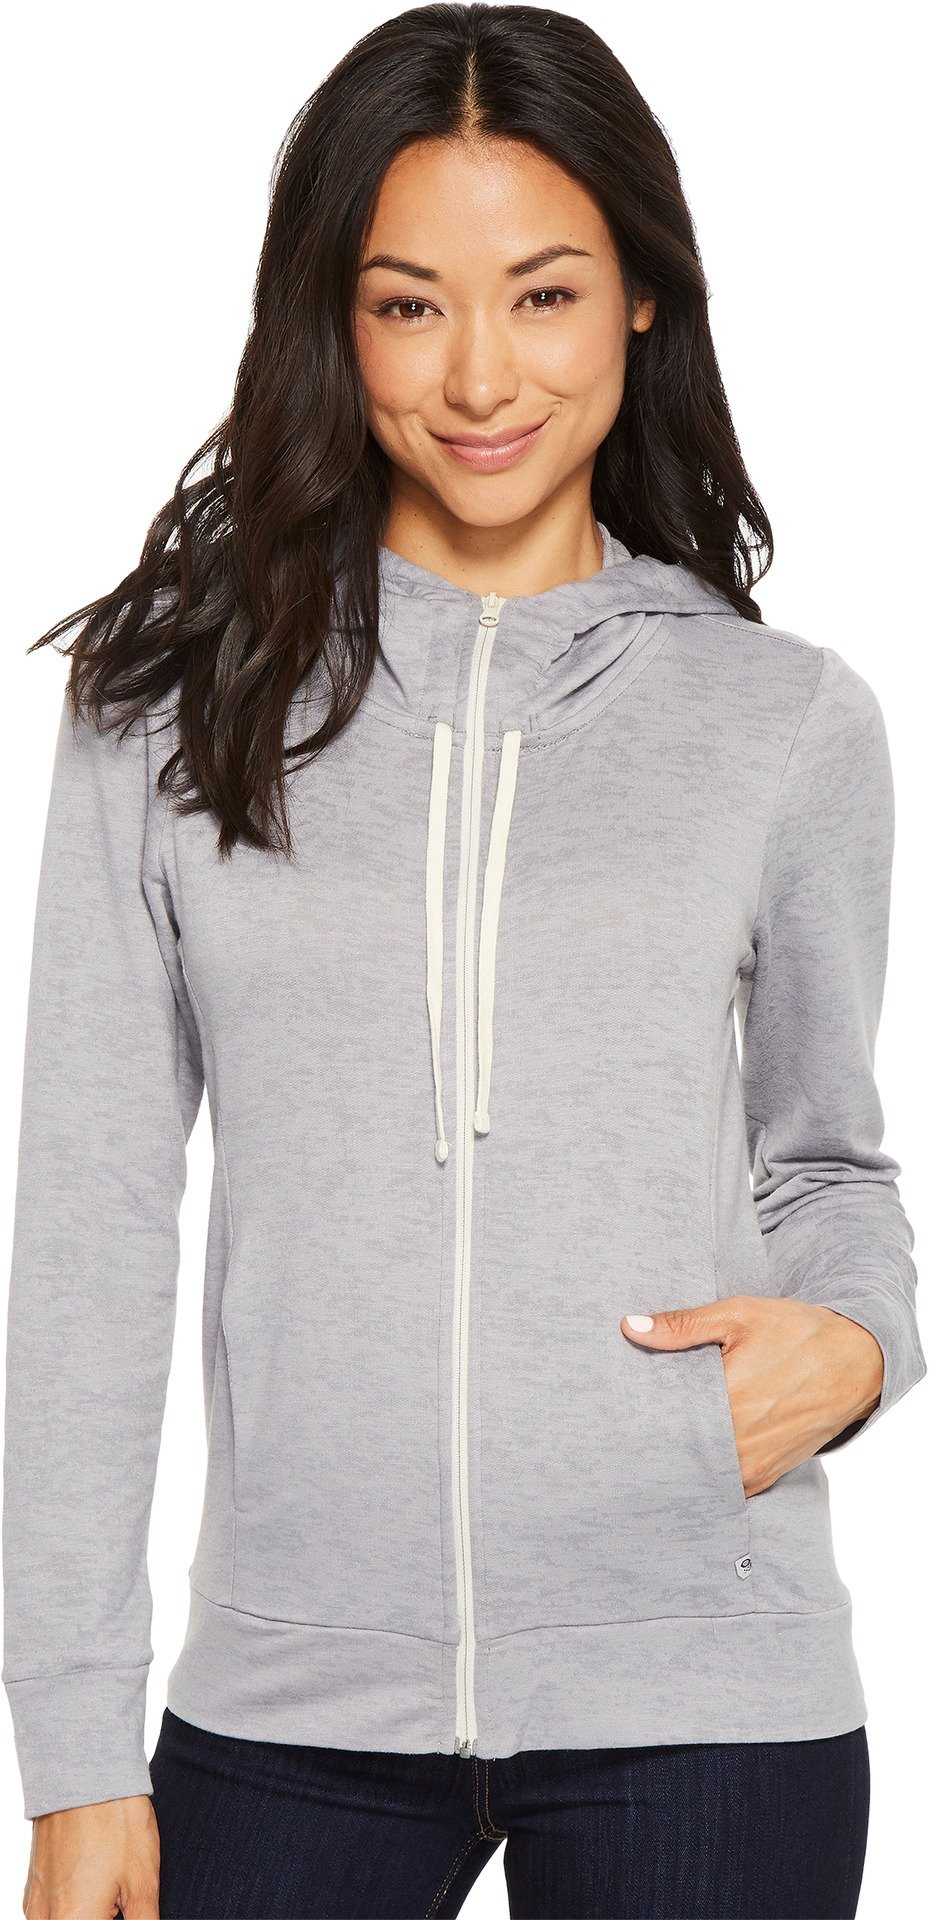 Mountain Hardwear Women's Burned Out Full Zip Hoody, Manta Grey, M